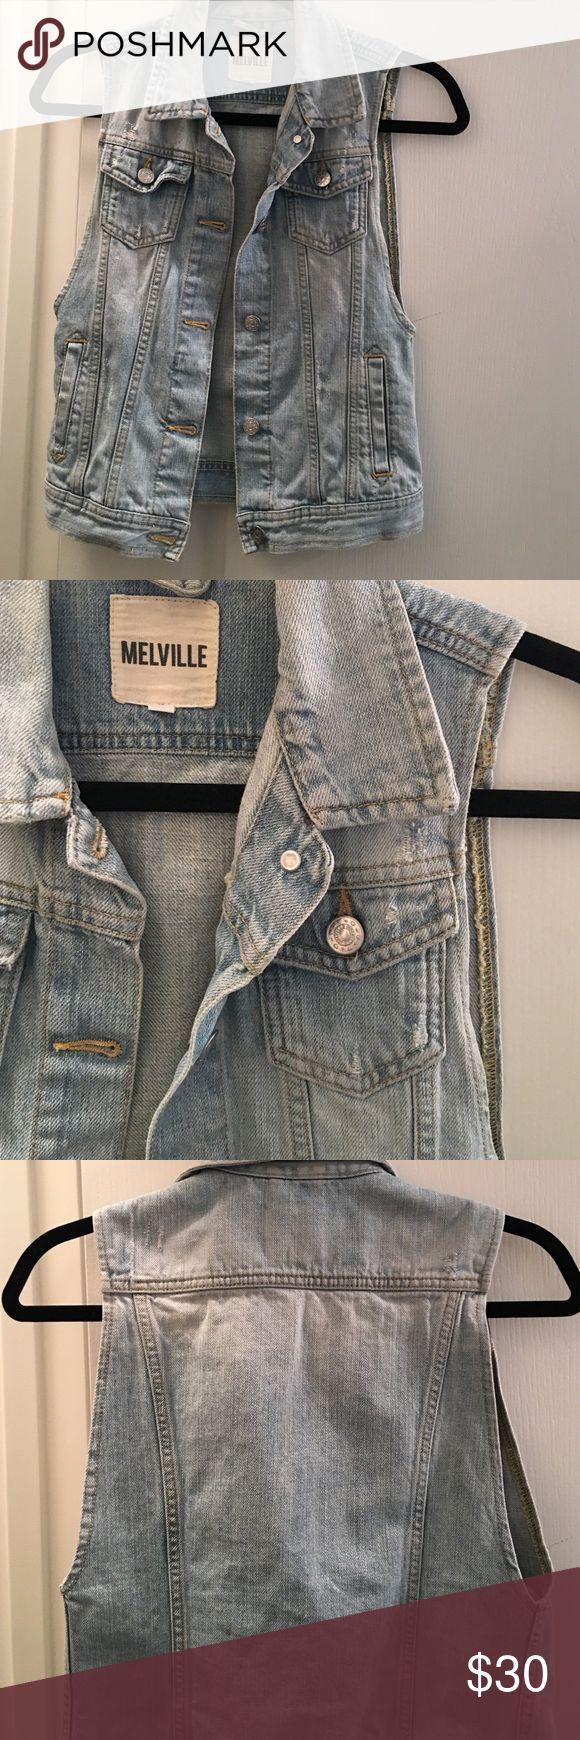 Brandy Melville denim vest Lightly worn but looks brand new. Brandy Melville Jackets & Coats Vests